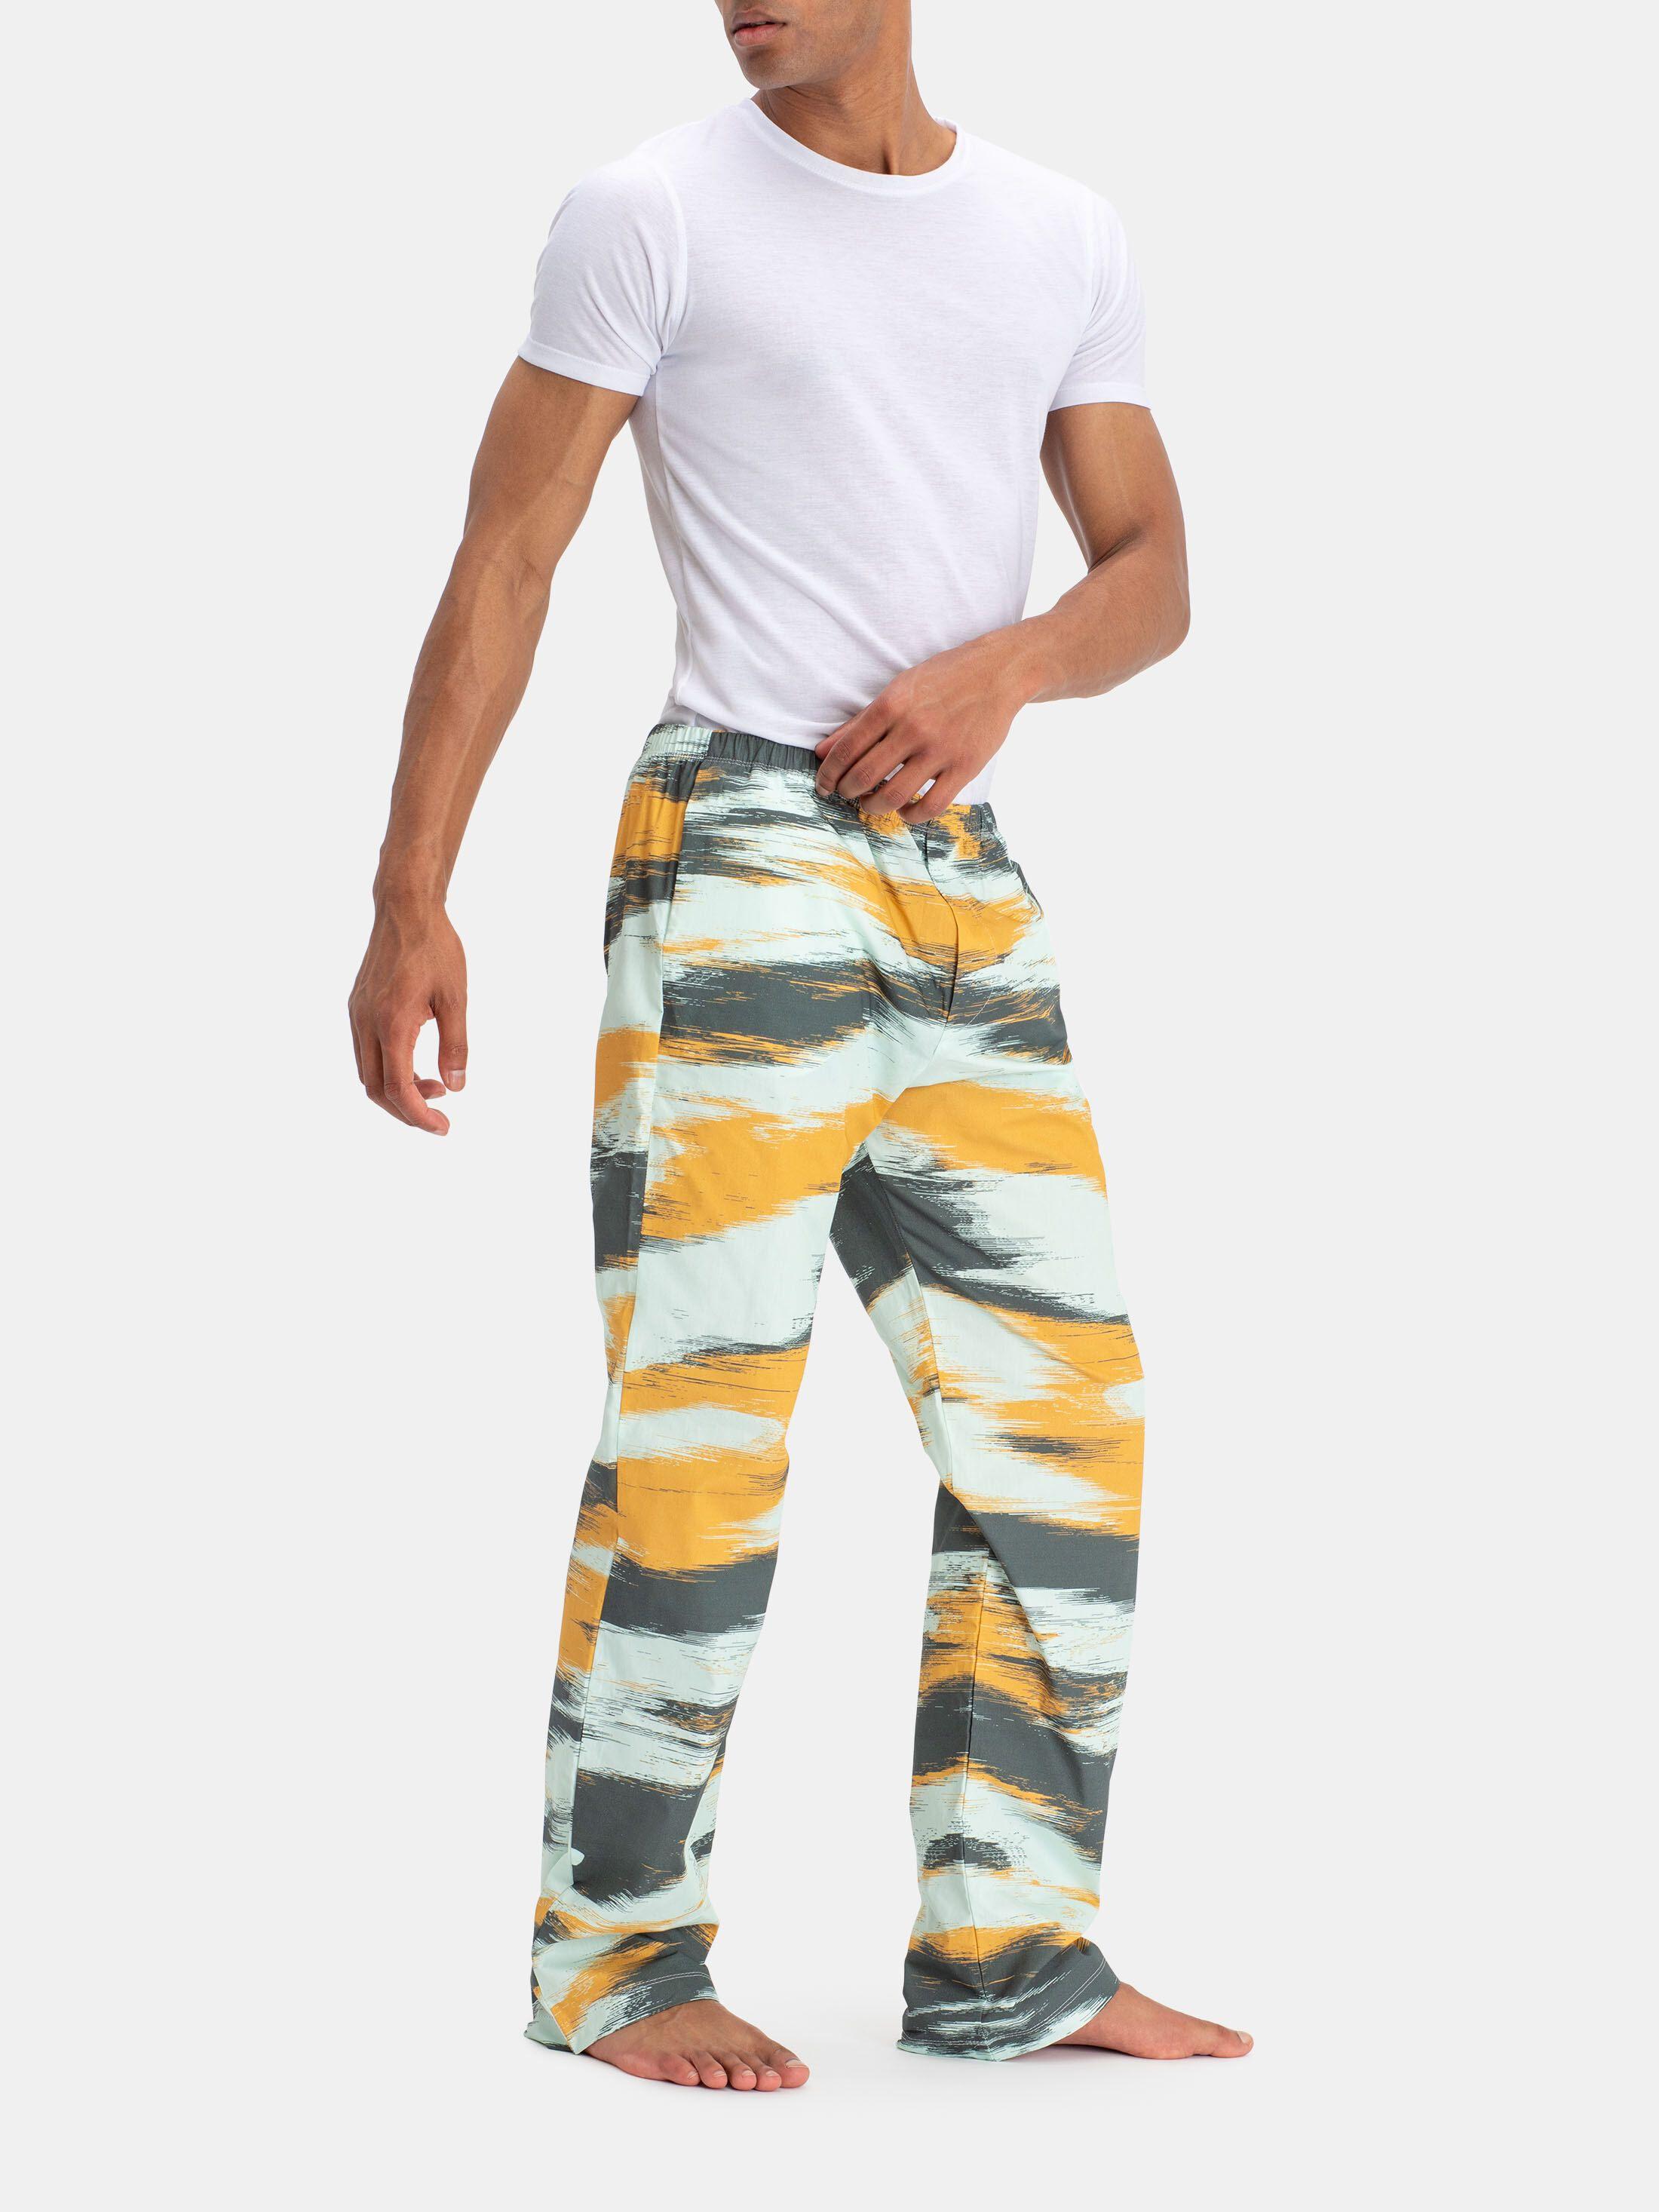 Print Pyjama bottoms create your own